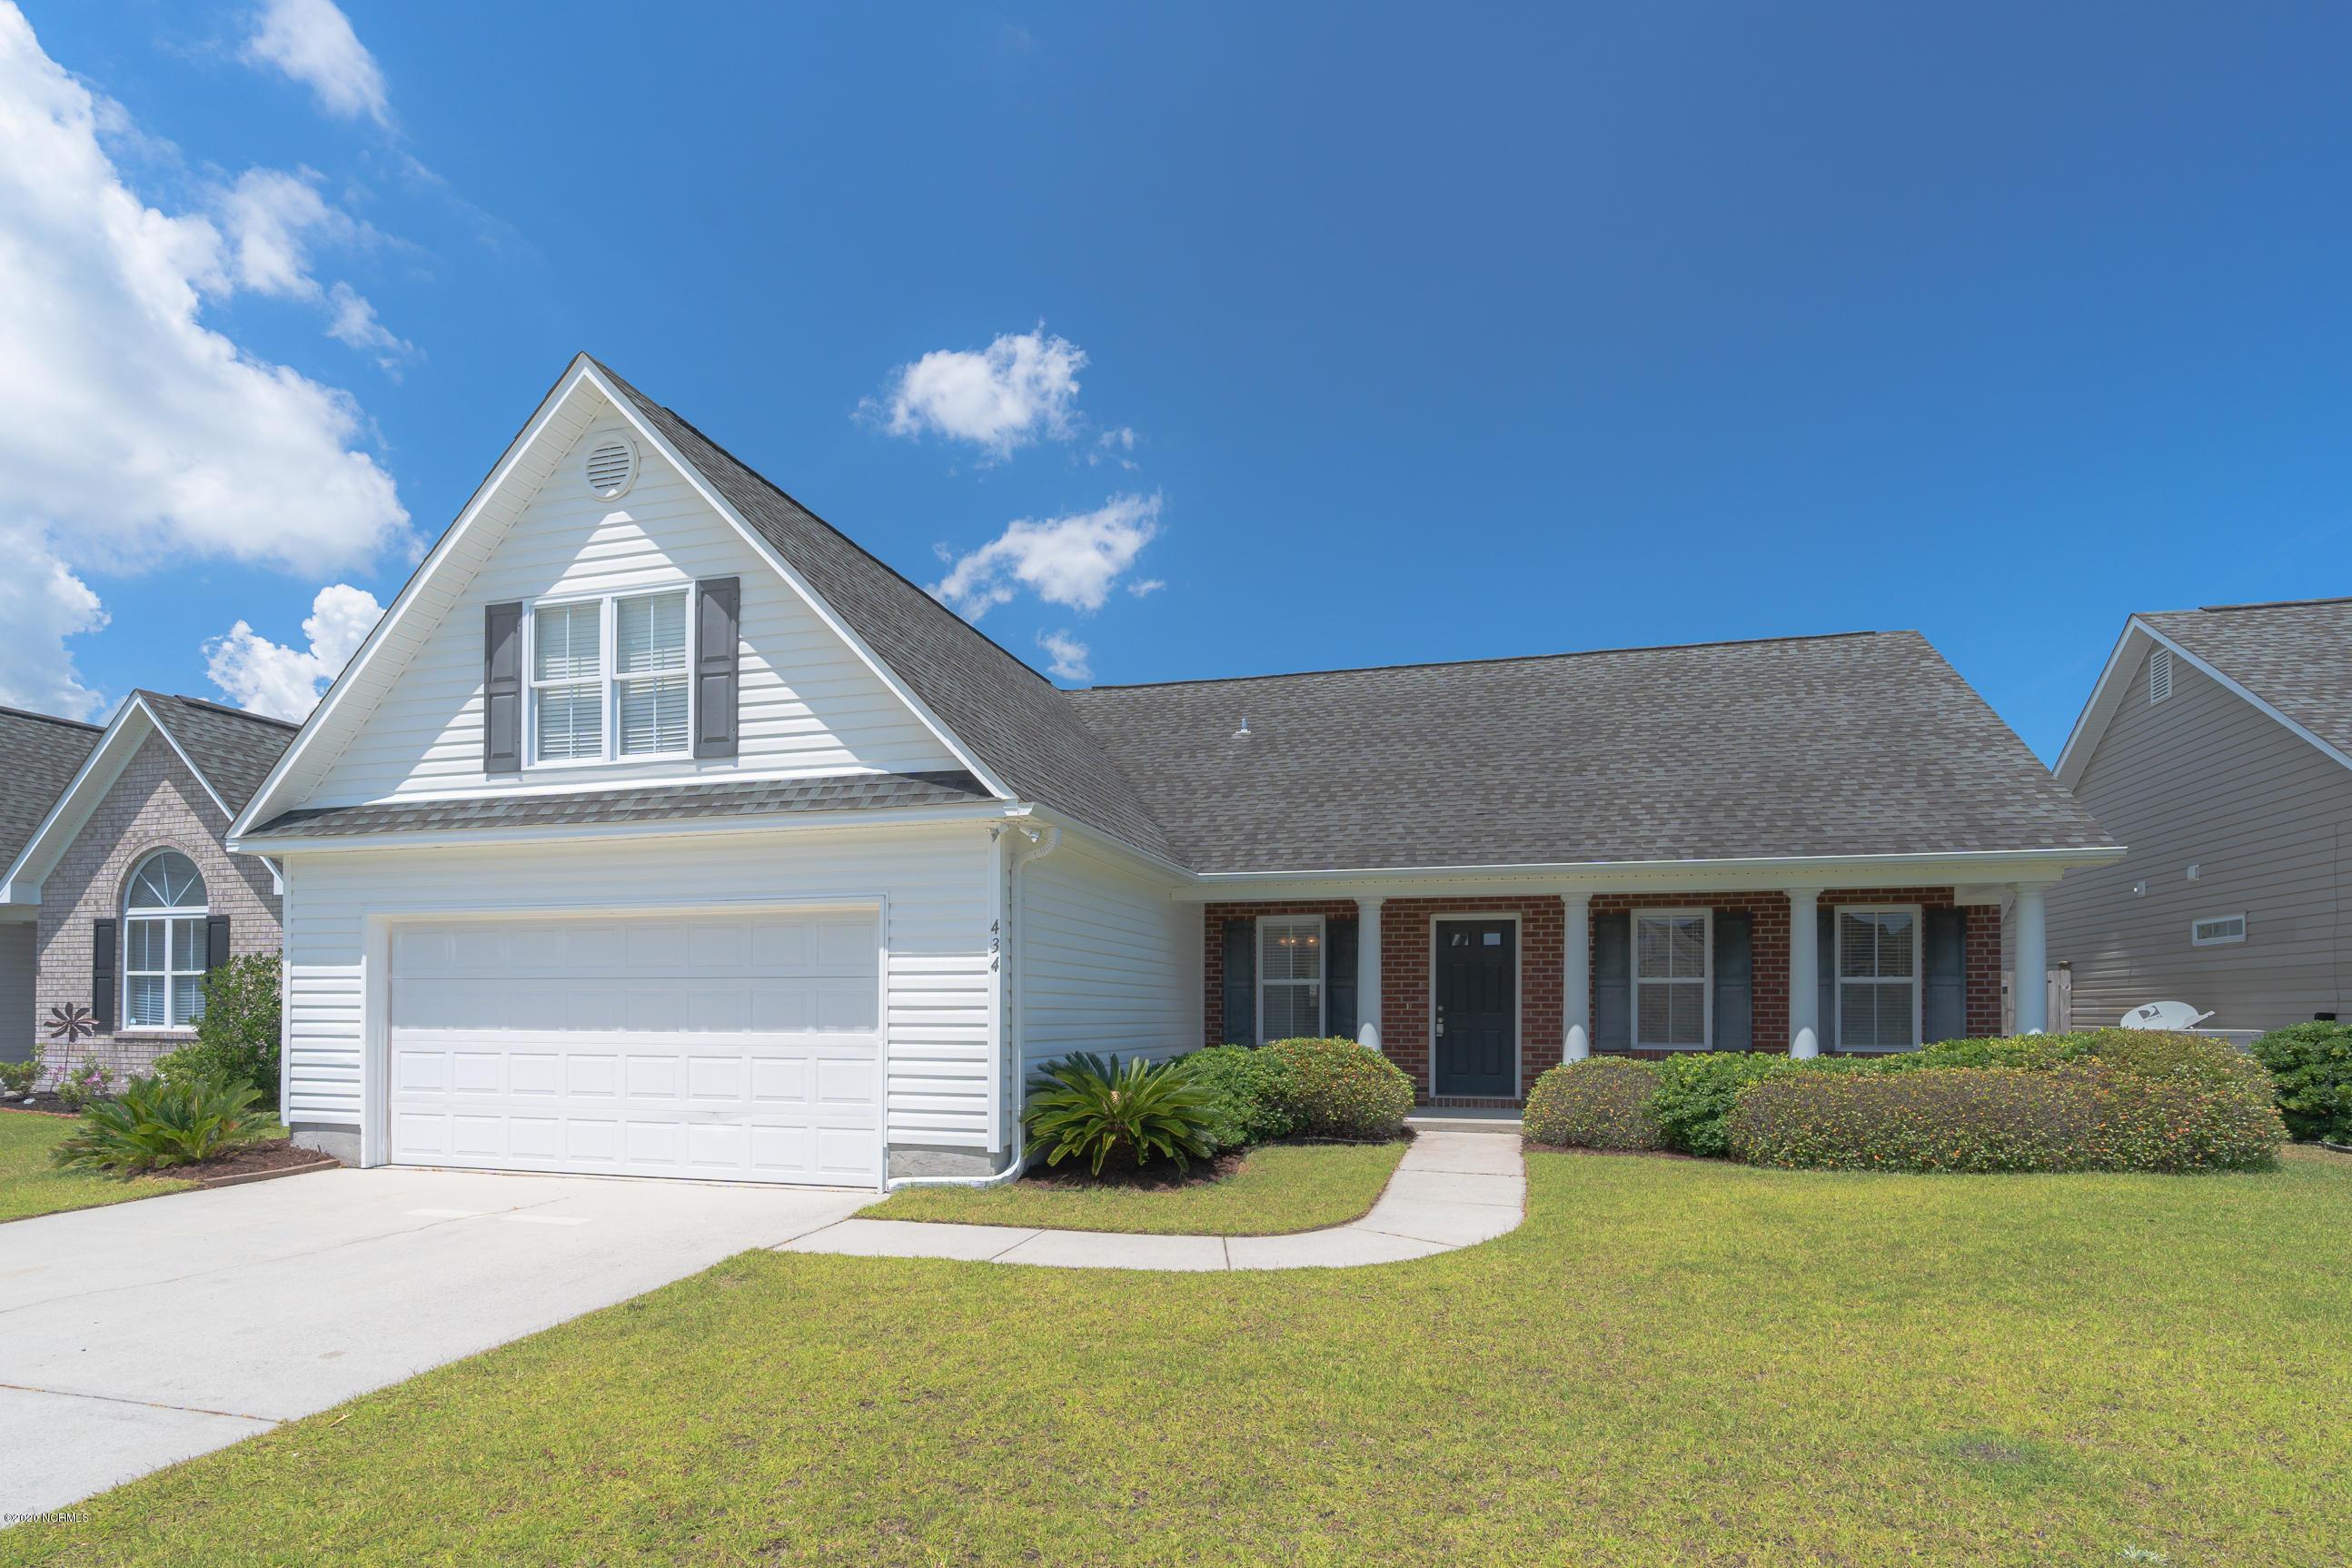 434 Putnam Drive, Wilmington, North Carolina 28411, 3 Bedrooms Bedrooms, ,2 BathroomsBathrooms,Residential,For Sale,Putnam,100228025